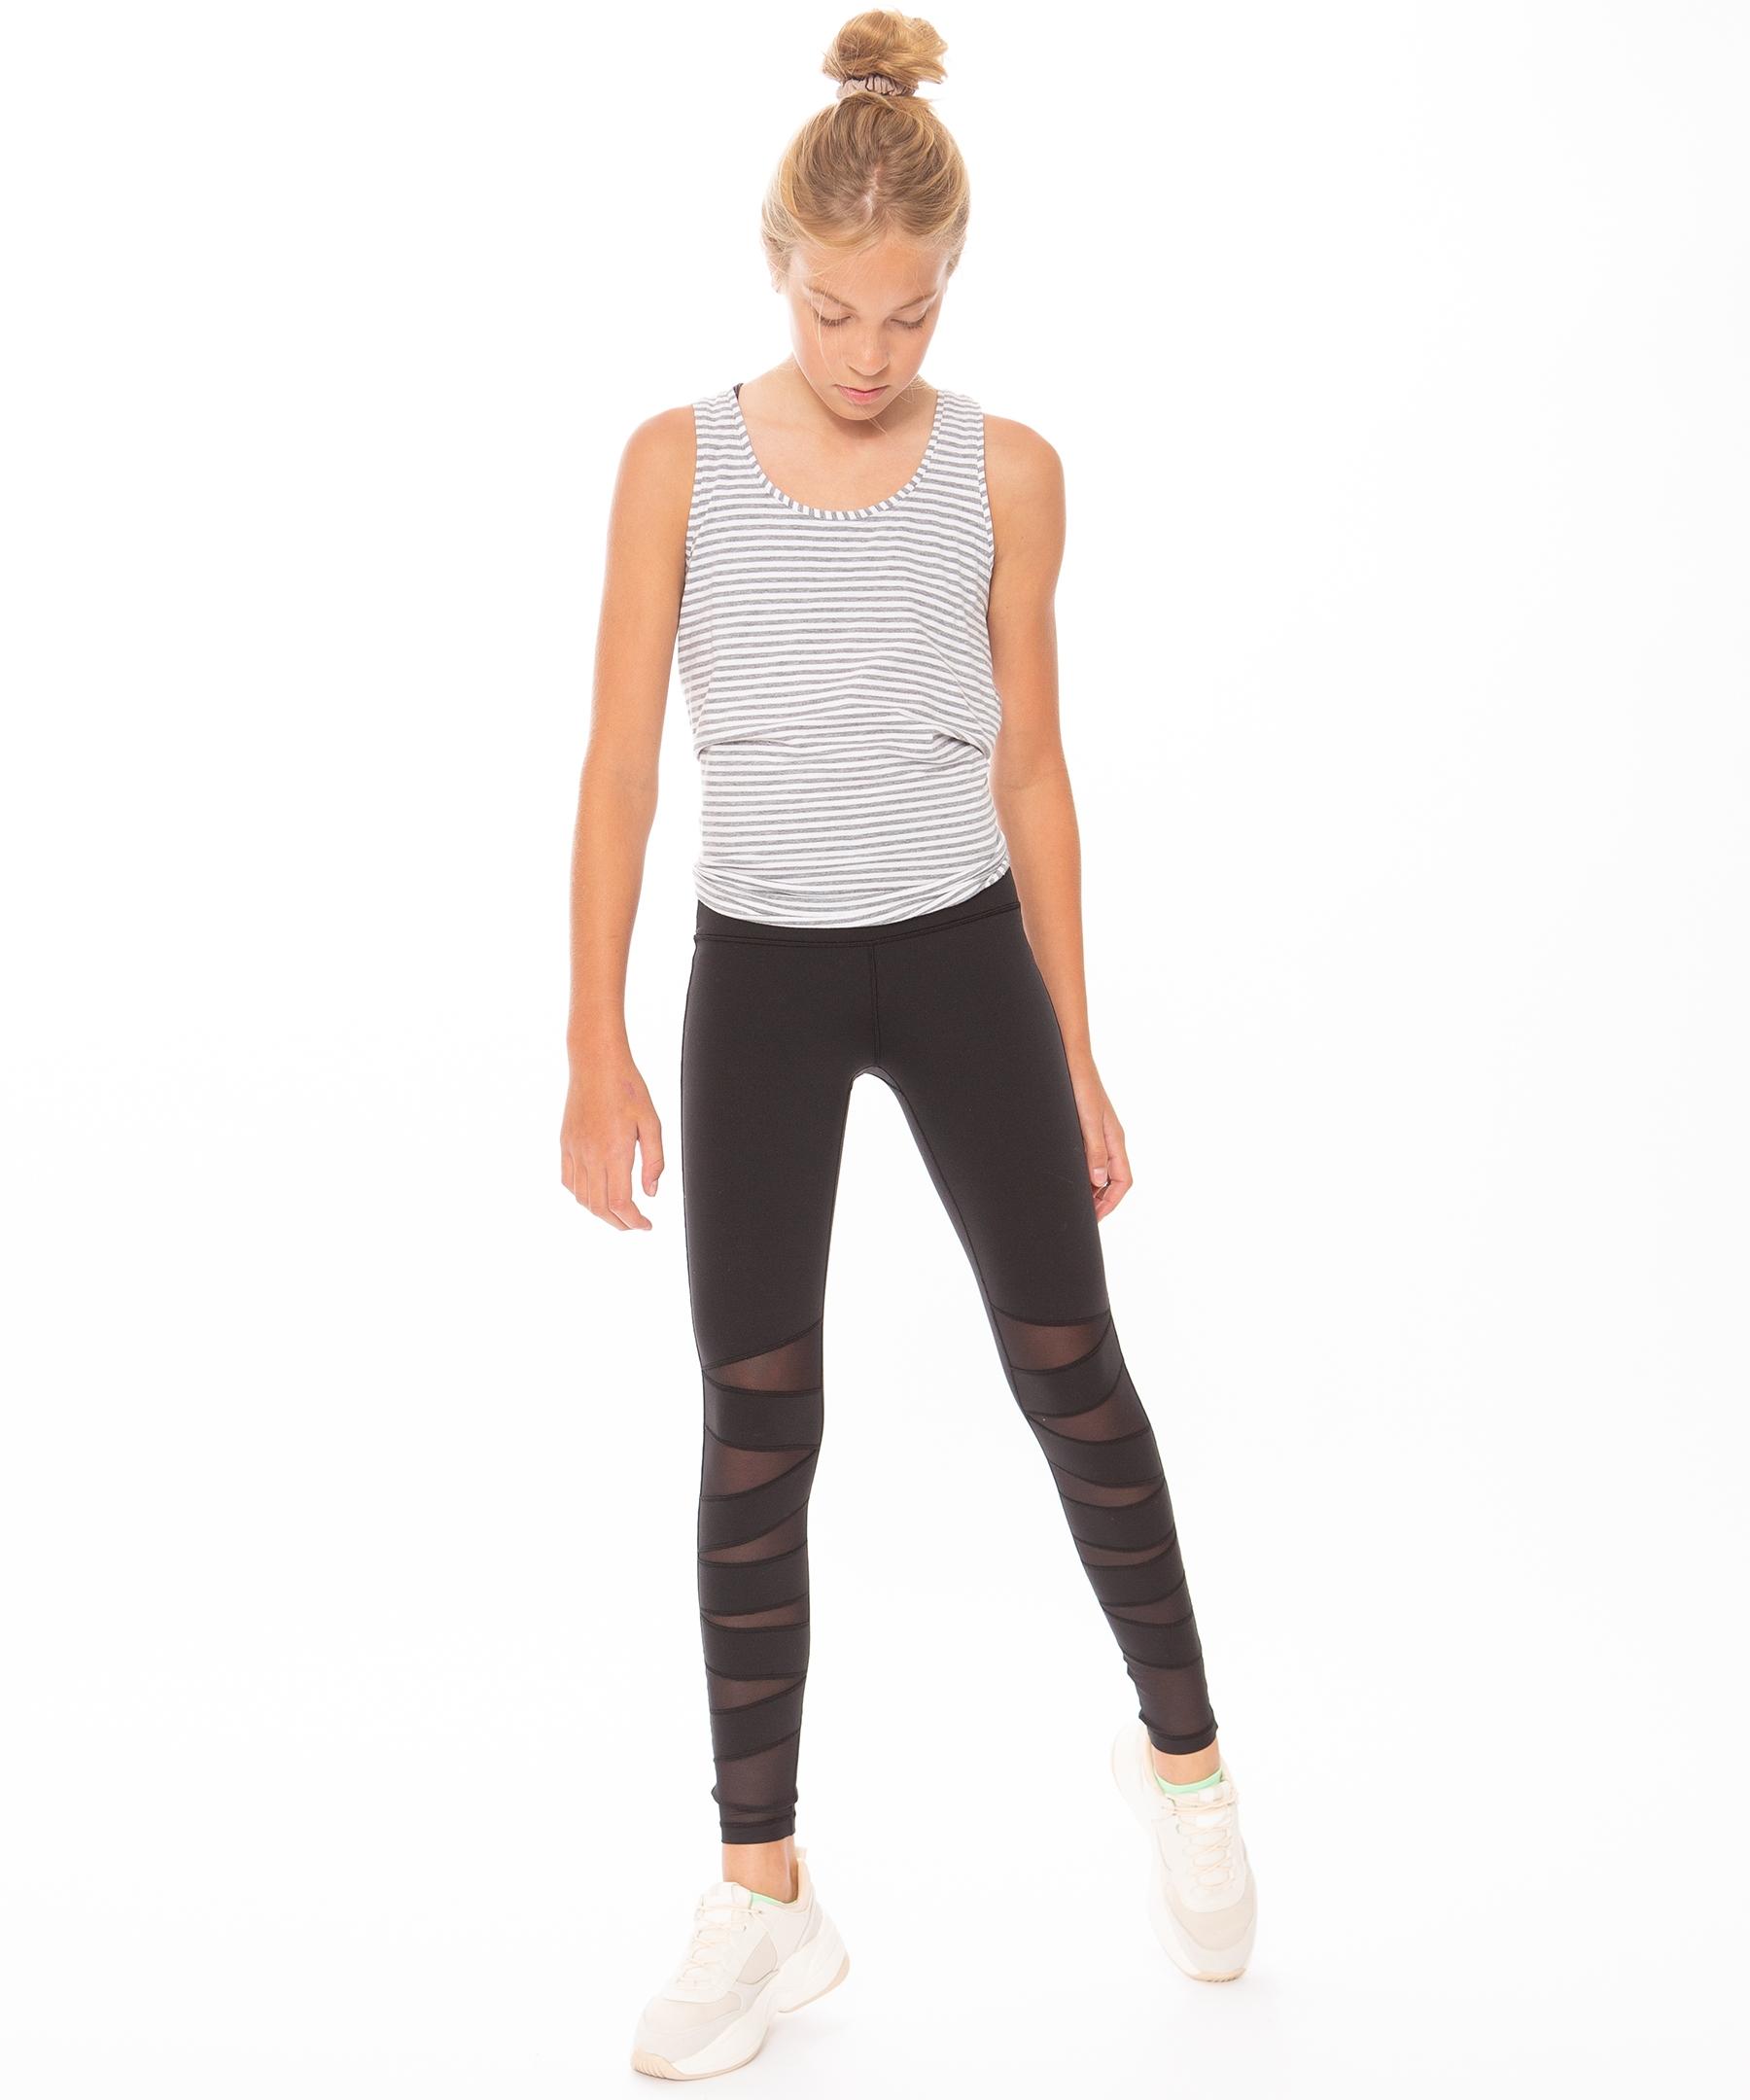 Leggins Fashion Mystical  Print Lycra- Dance Leggings Free Style